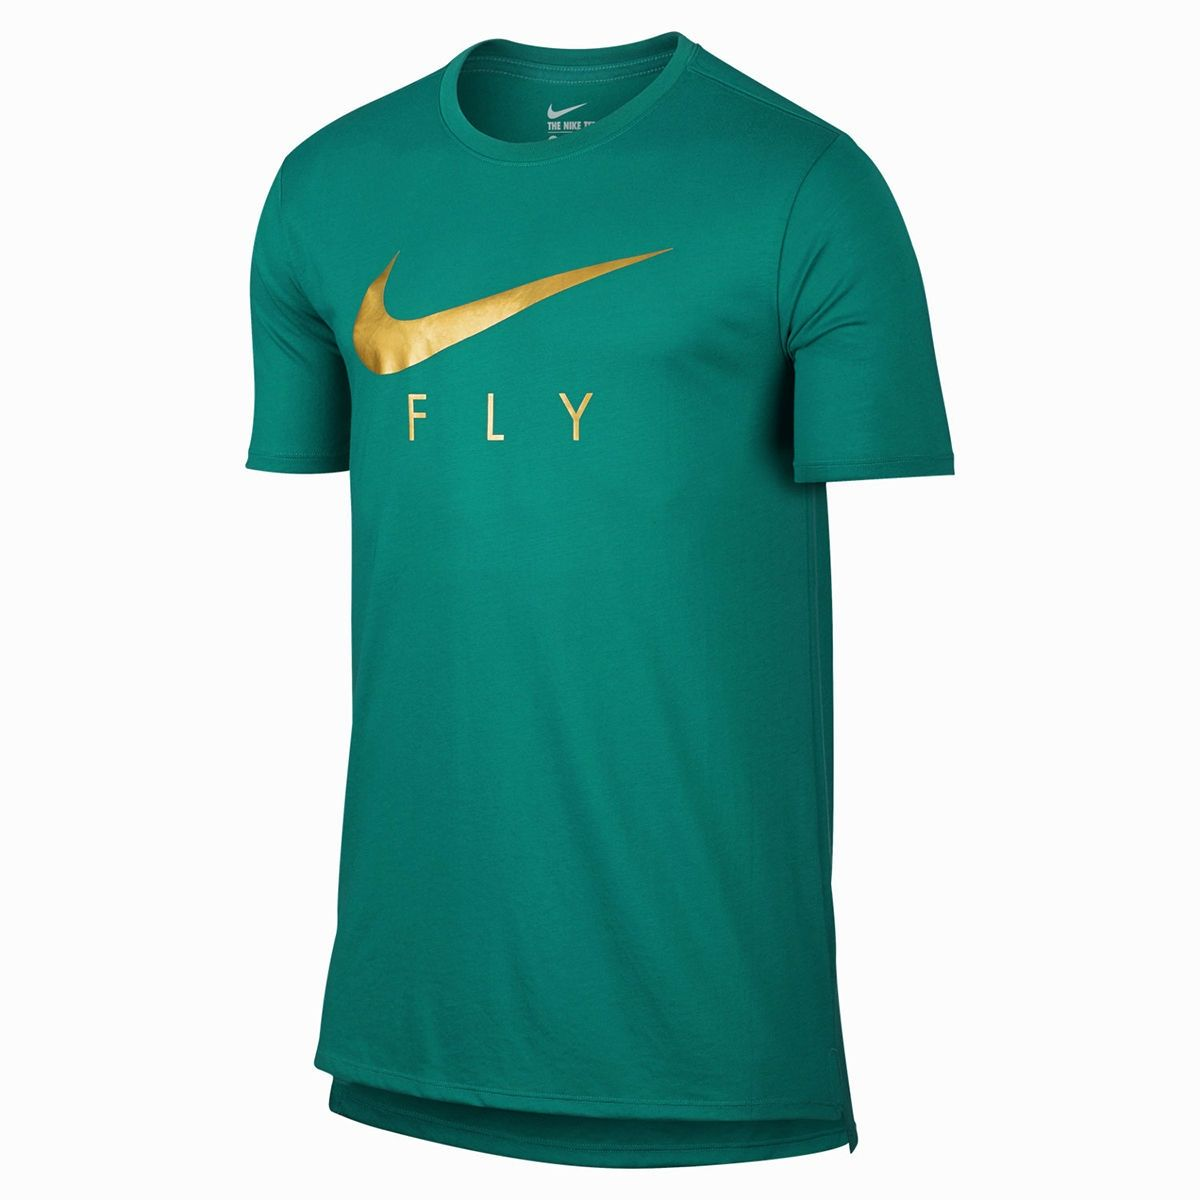 Ceder perspectiva Habitat  Camiseta de manga corta Nike Fly Droptail